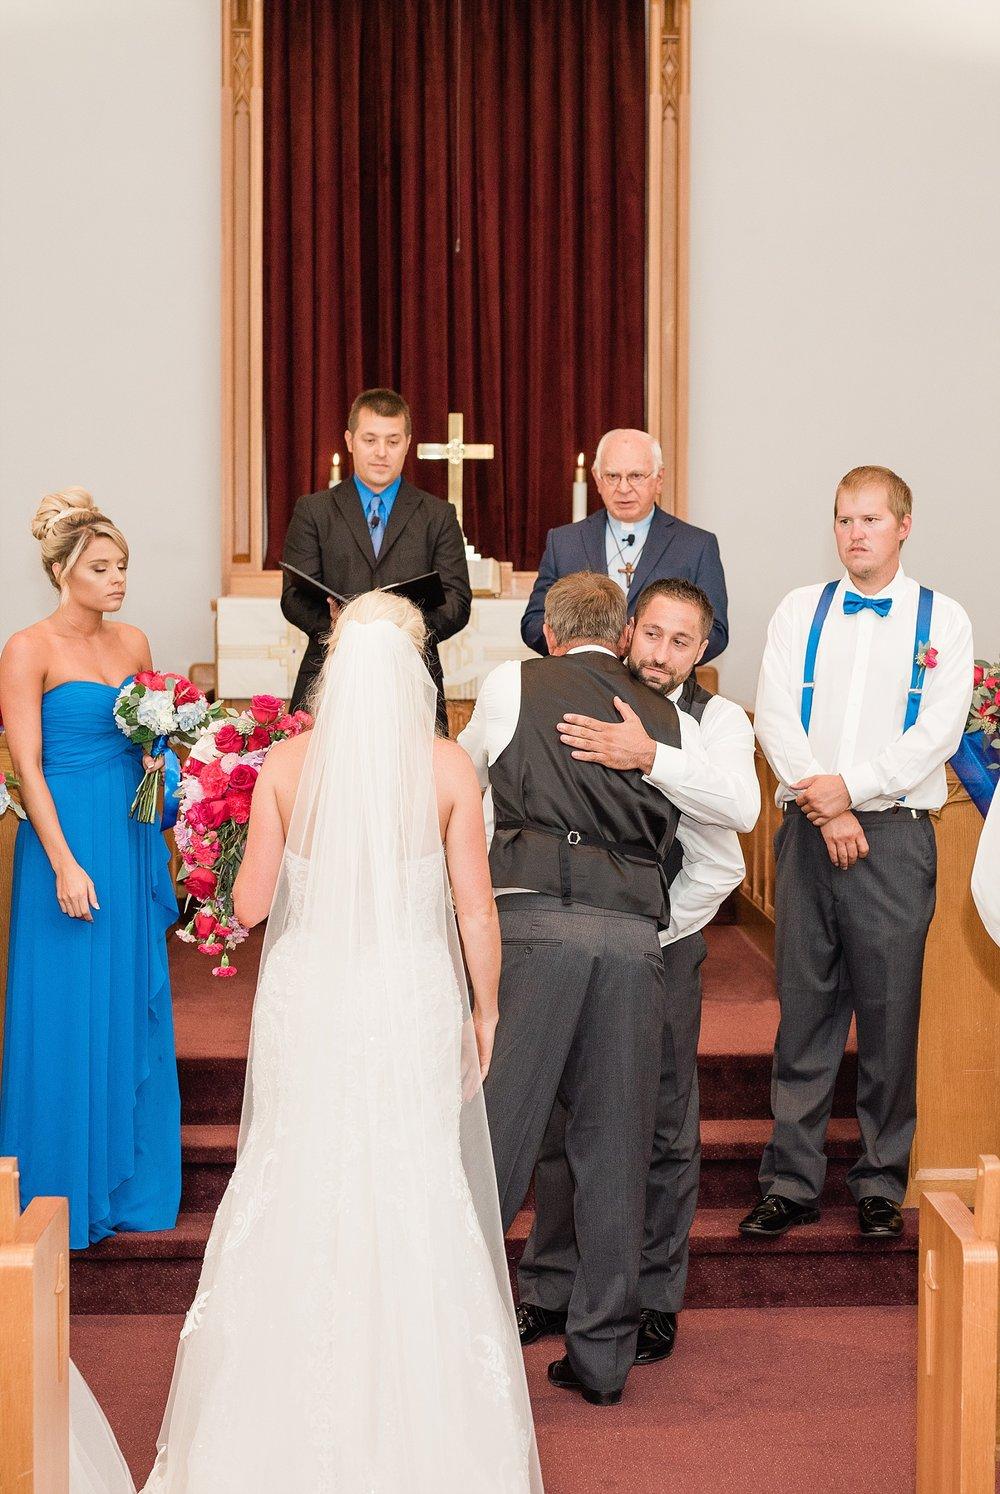 Alan and Heather Horn Wedding by Kelsi Kliethermes Photography Associate - Rachel_0044.jpg